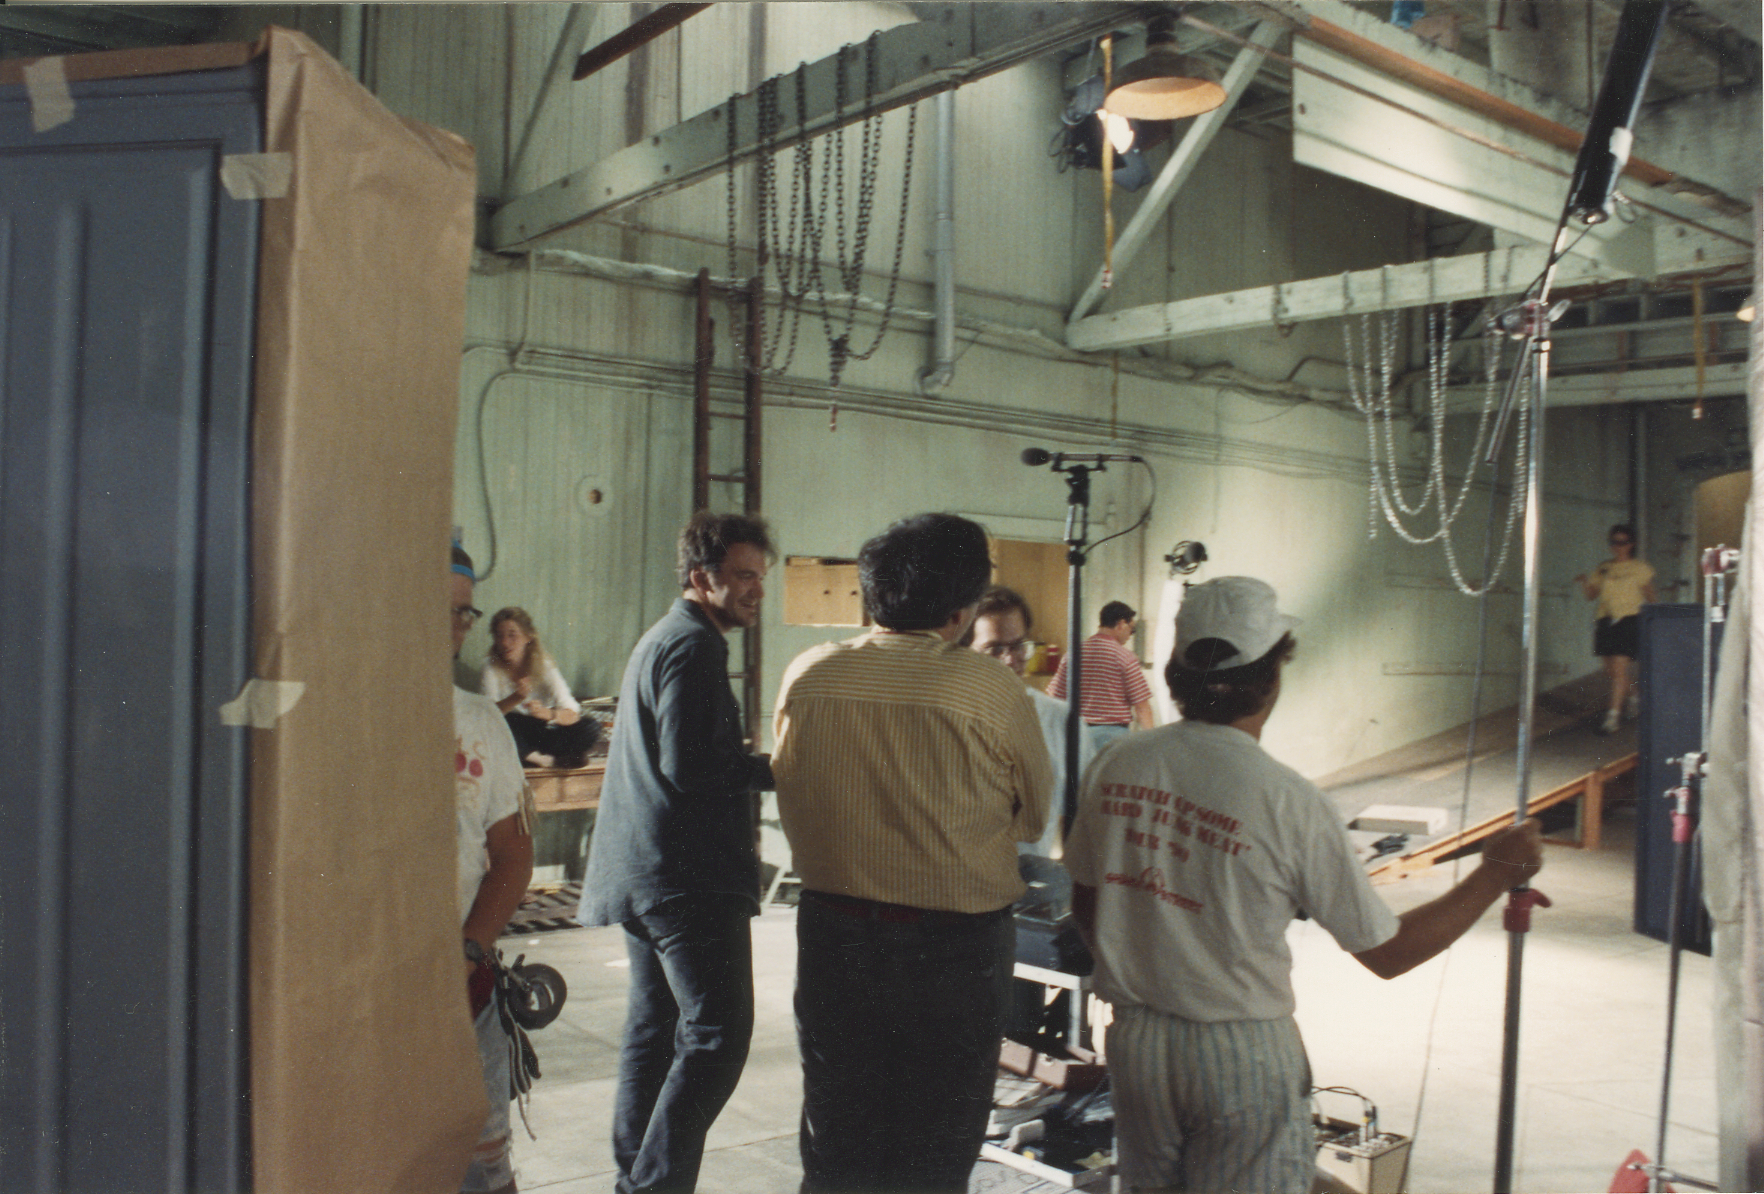 Quentin Tarantino in Reservoir Dogs (1992)